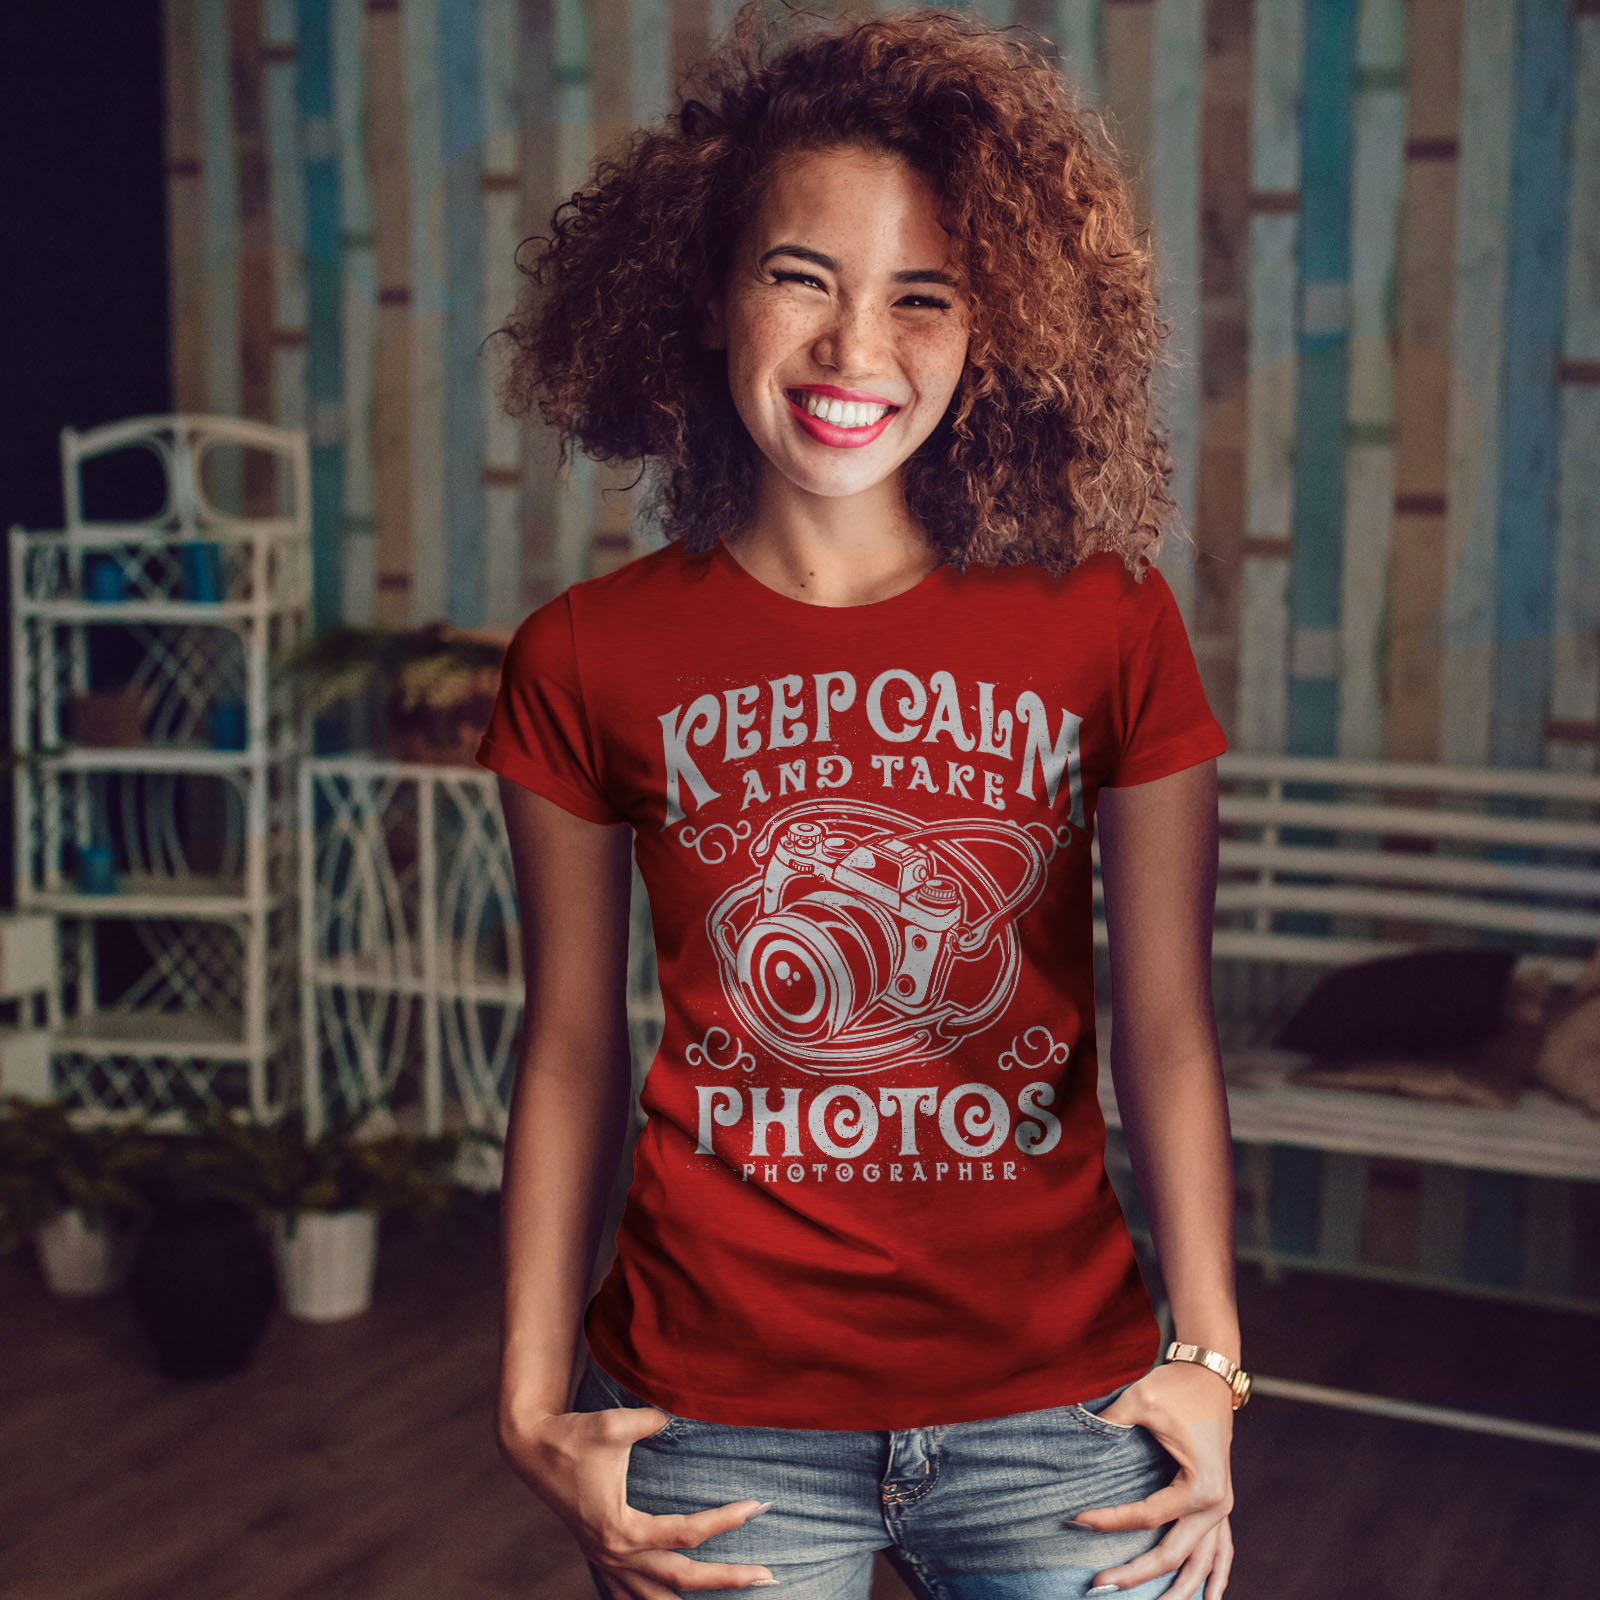 Calm-Photographer-Fashion-Women-T-shirt-NEW-Wellcoda miniatuur 10